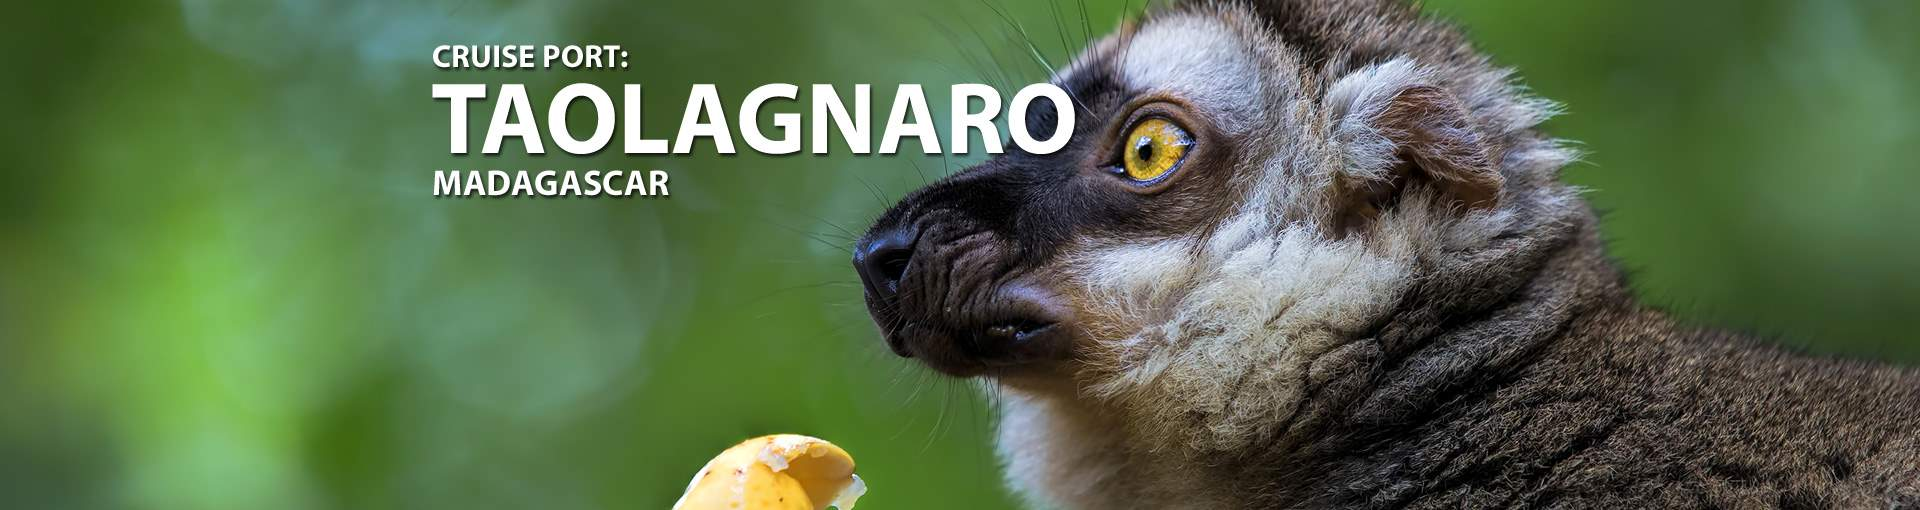 Cruises to Taolagnaro,Madagascar